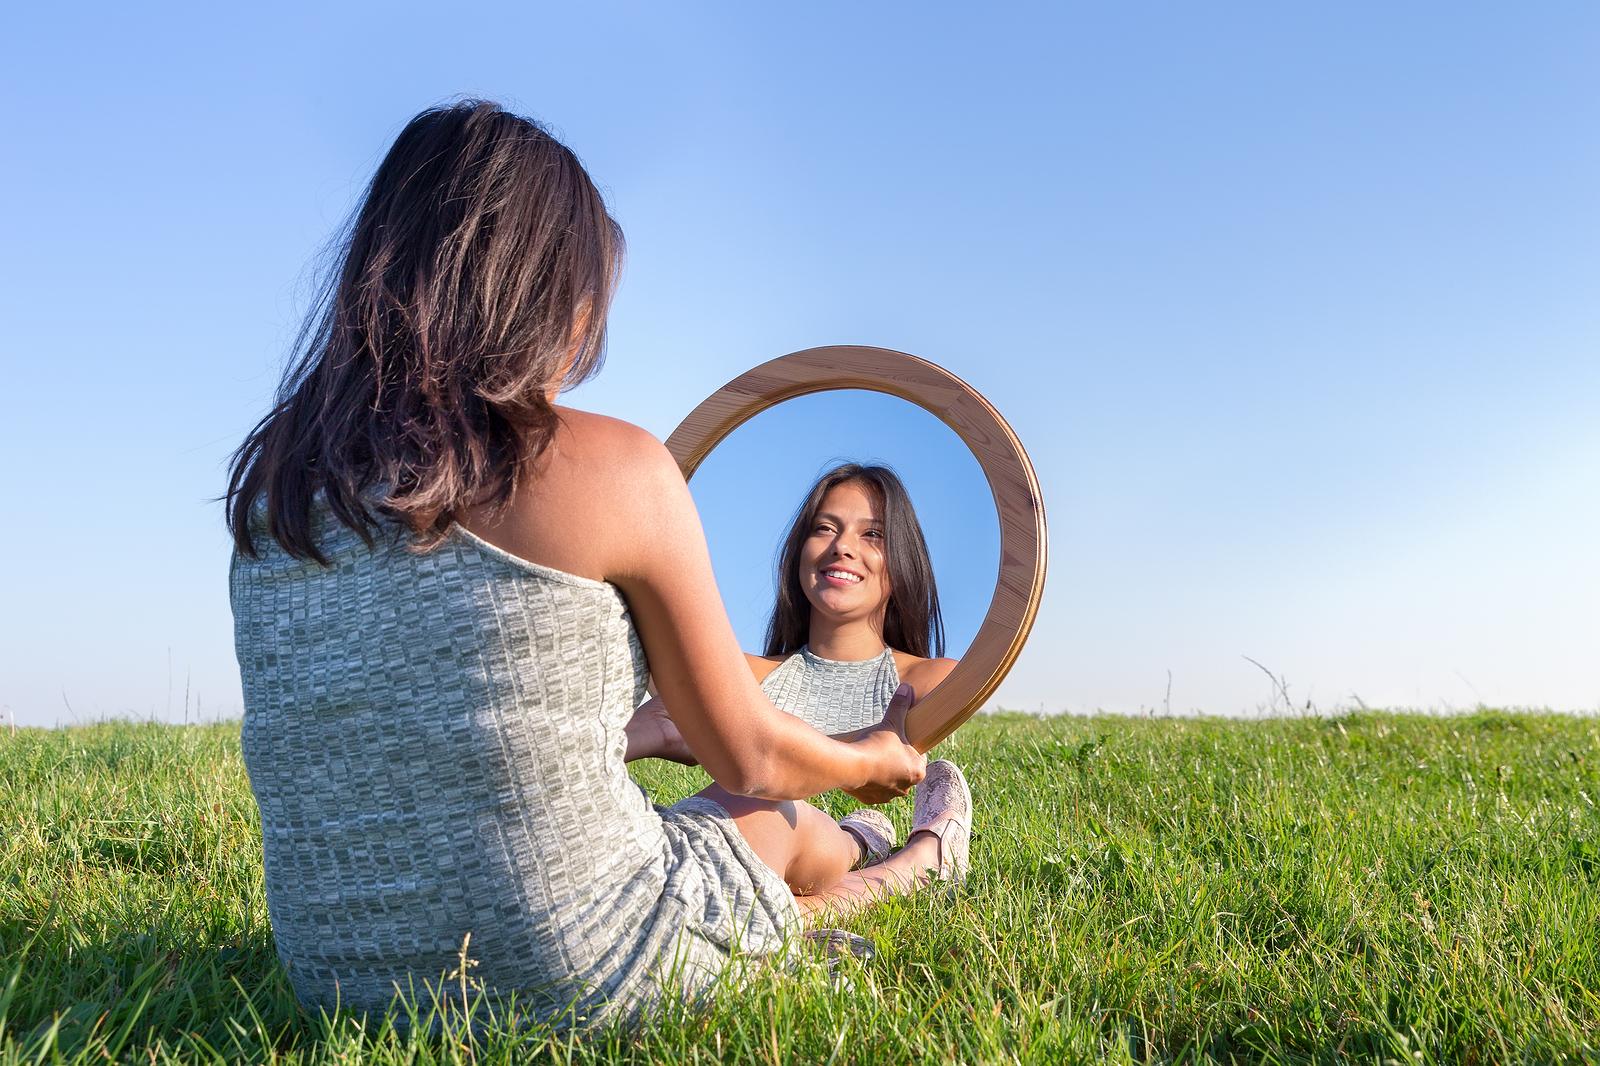 bakjac mirror.jpg